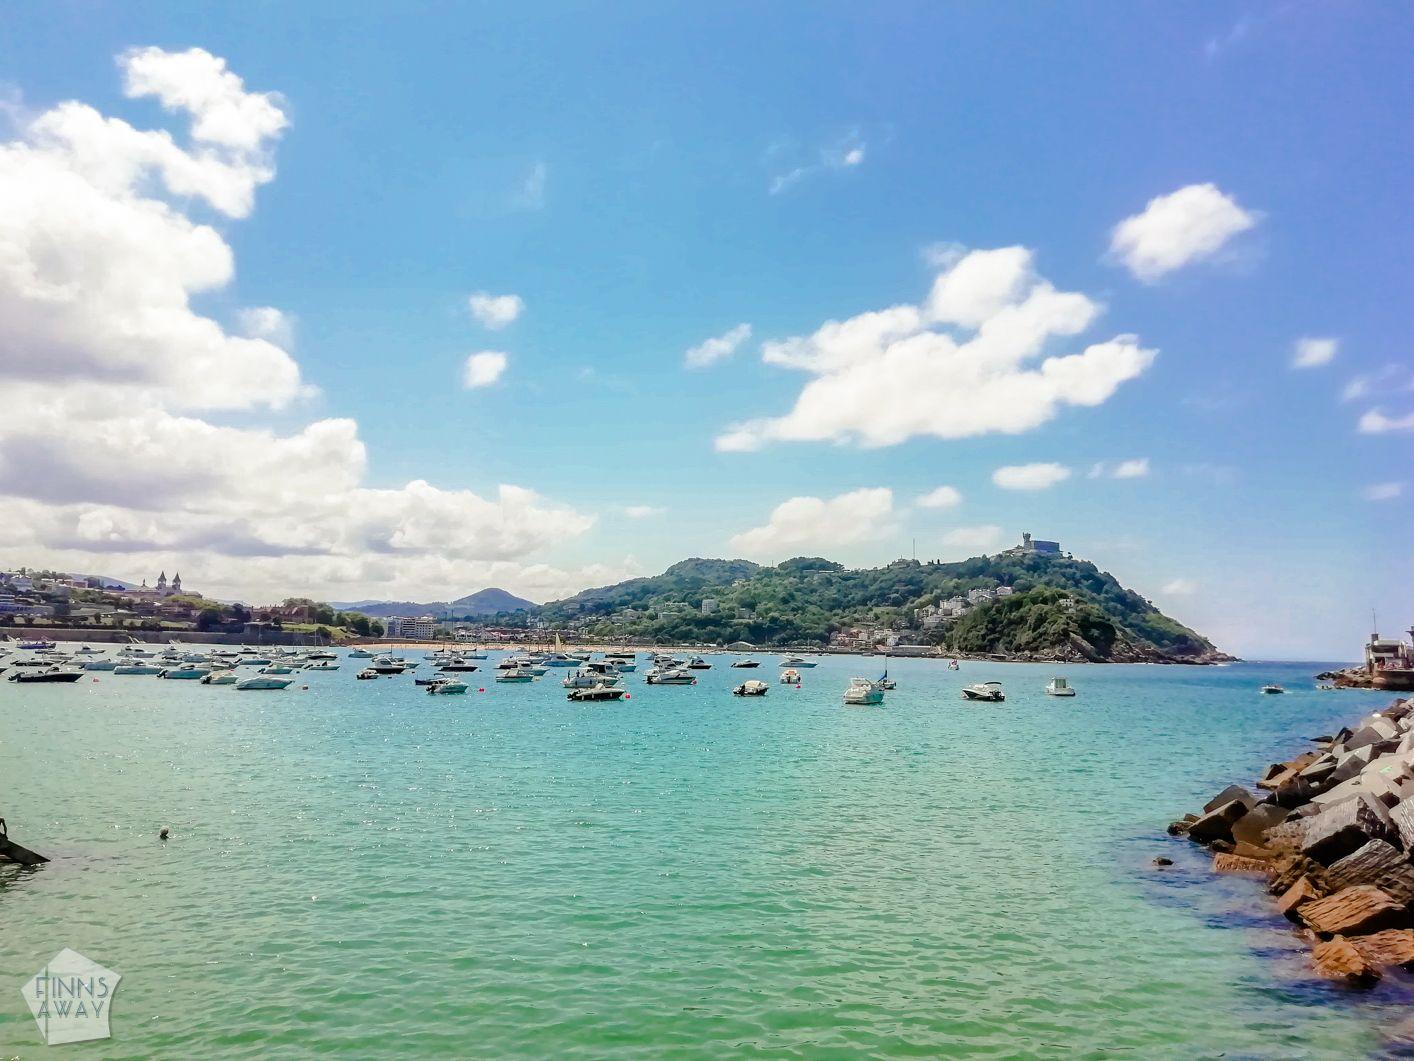 Donostia - San Sebastian | Basque Country | FinnsAway Travel Blog